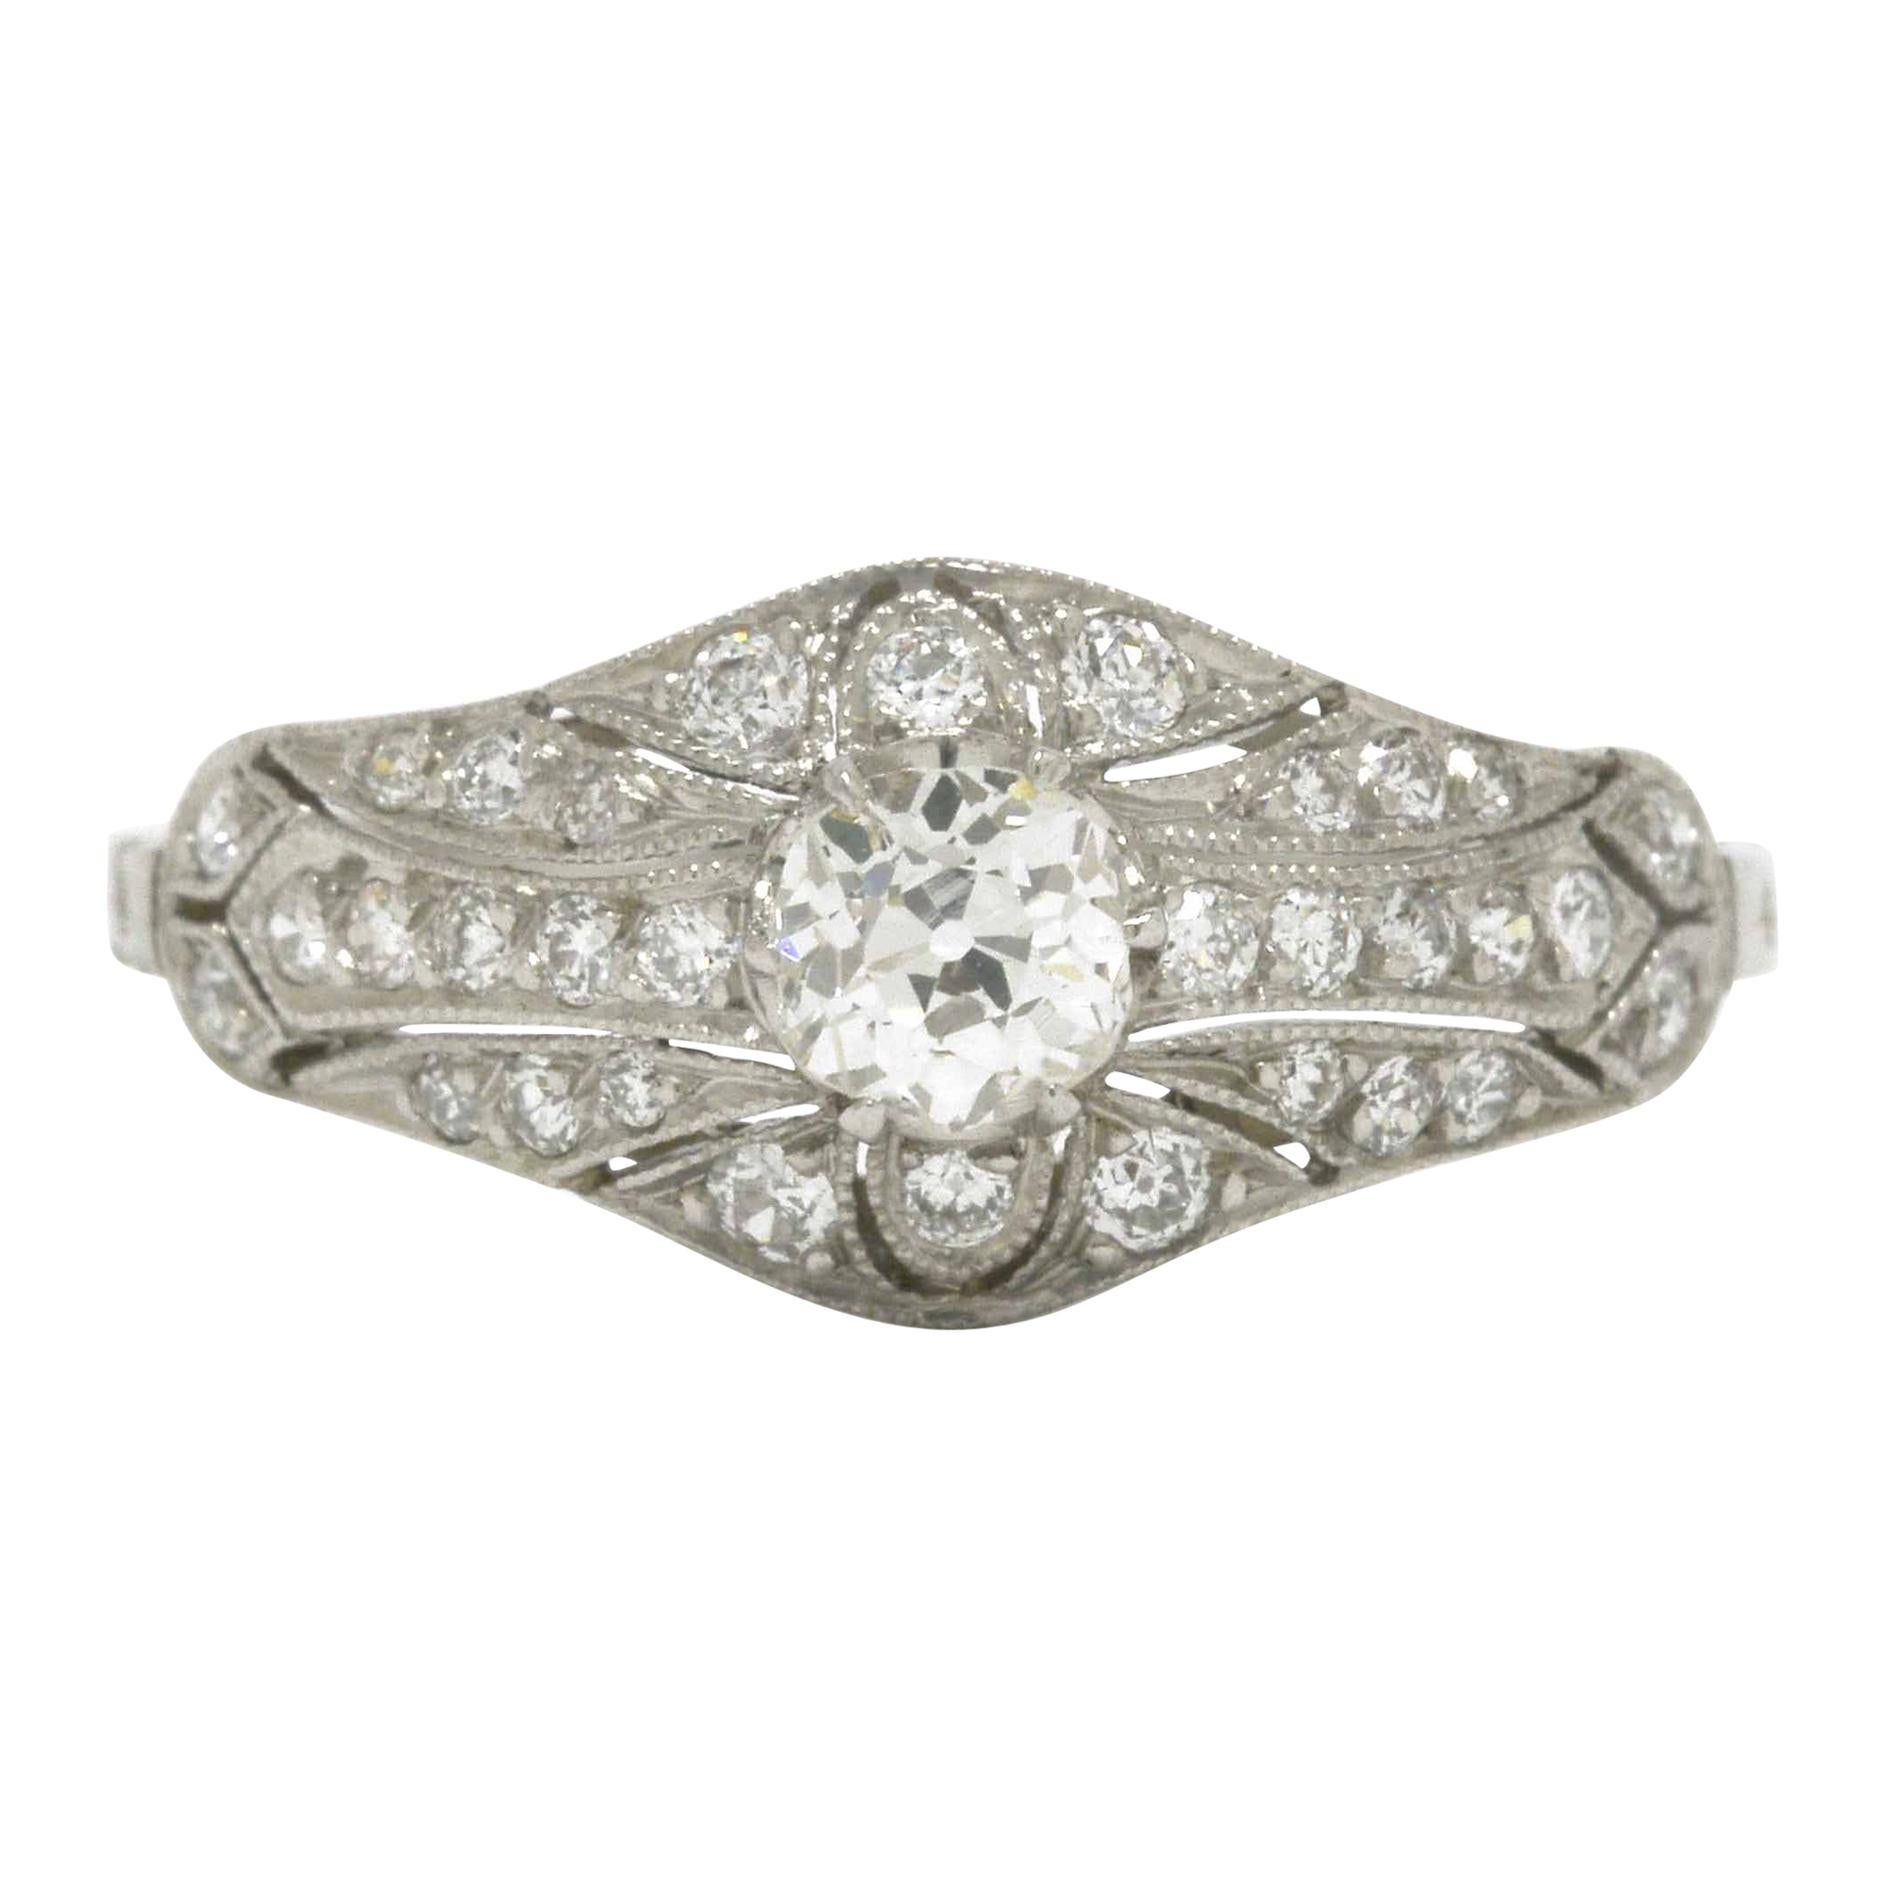 Edwardian Antique Diamond Engagement Ring Filigree Platinum Estate Heirloom